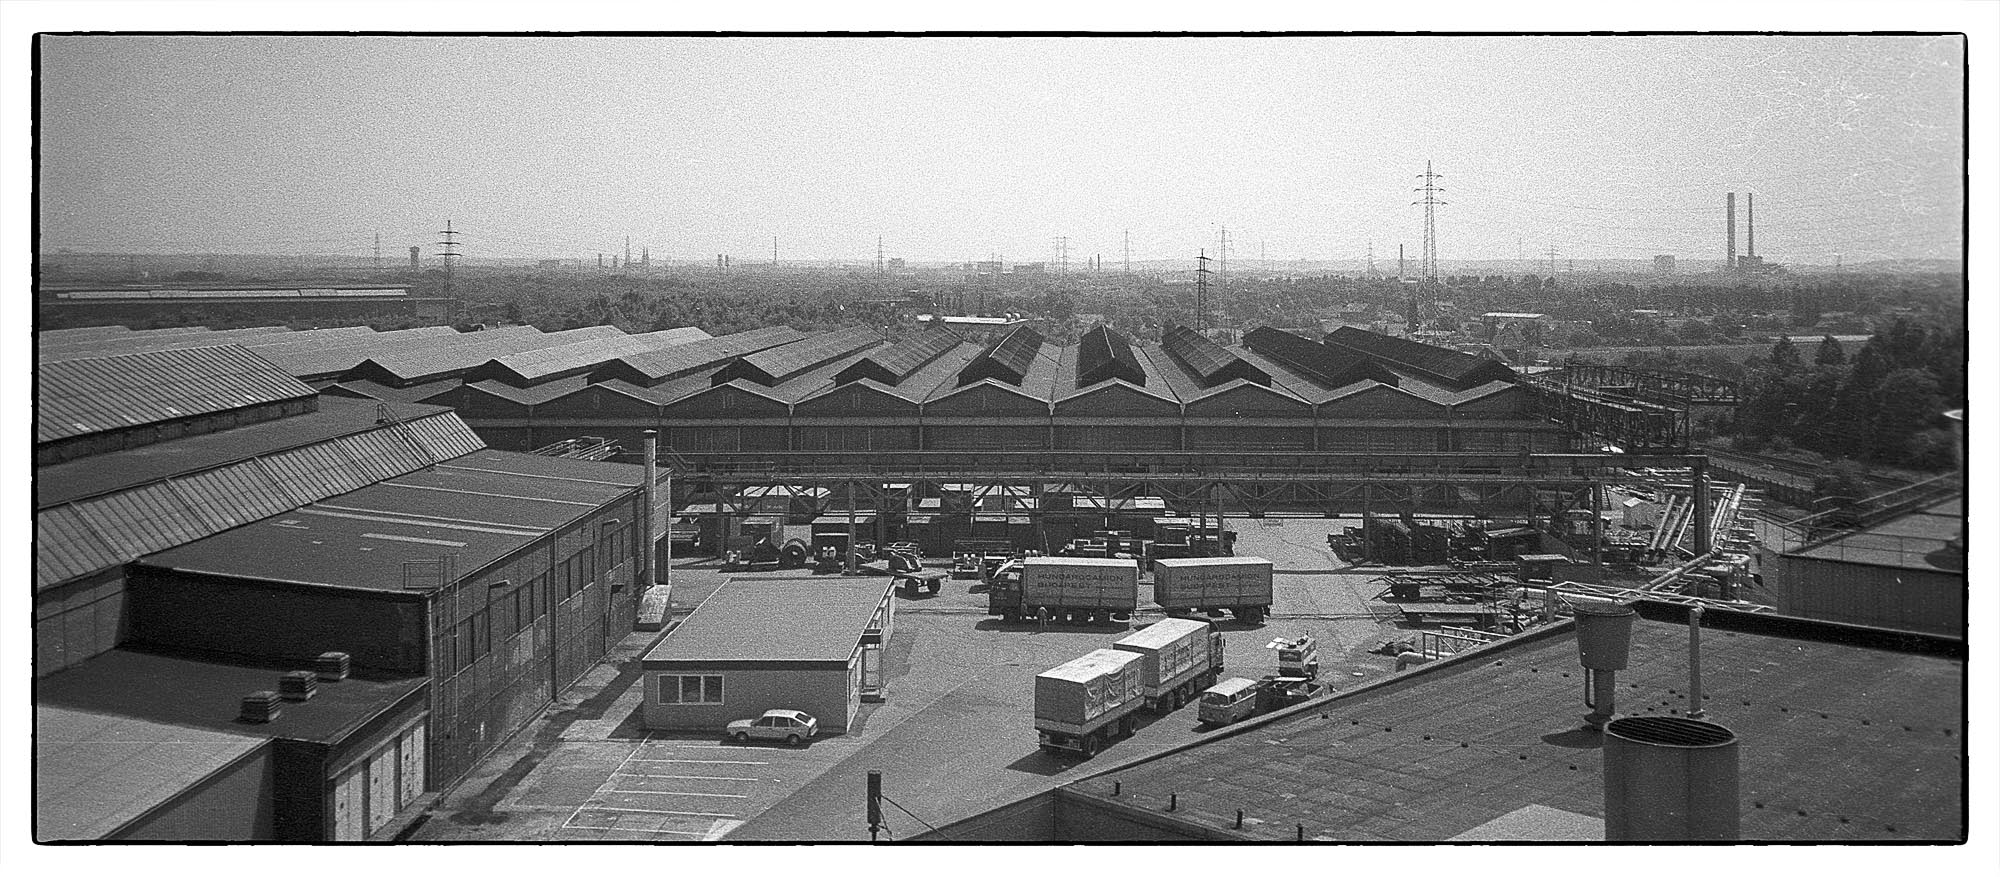 Stahlhandel Oberhausen Sterkrade, 1986